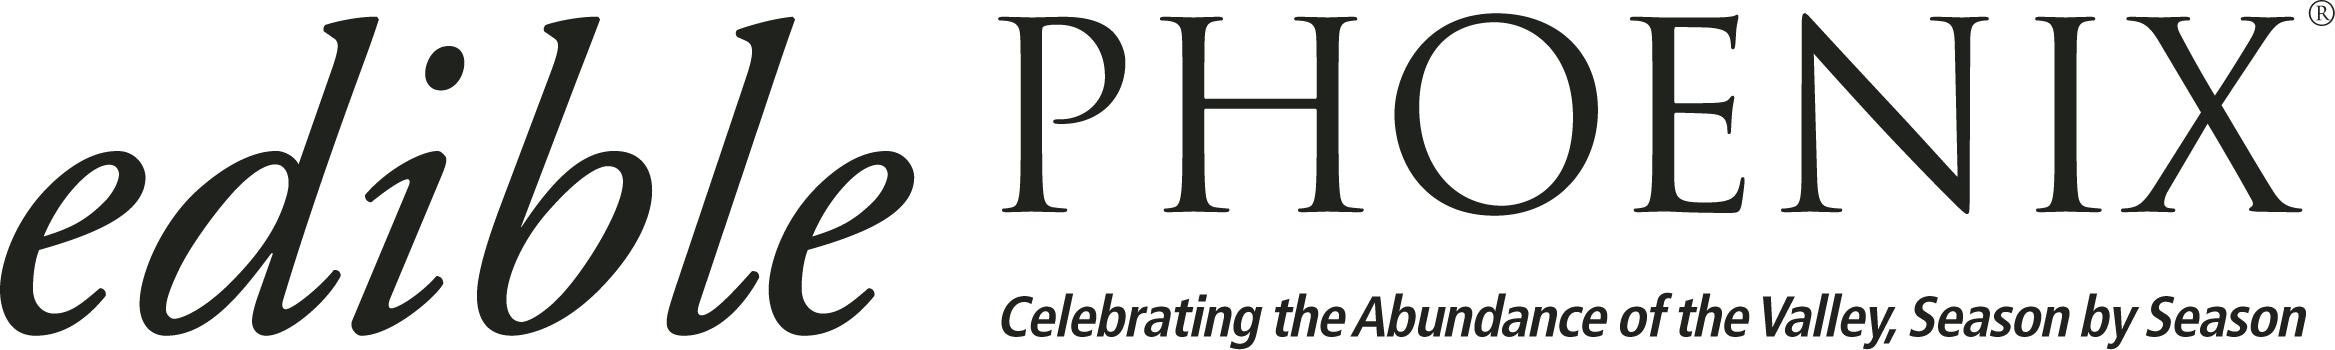 Media-Edible Phoenix.png